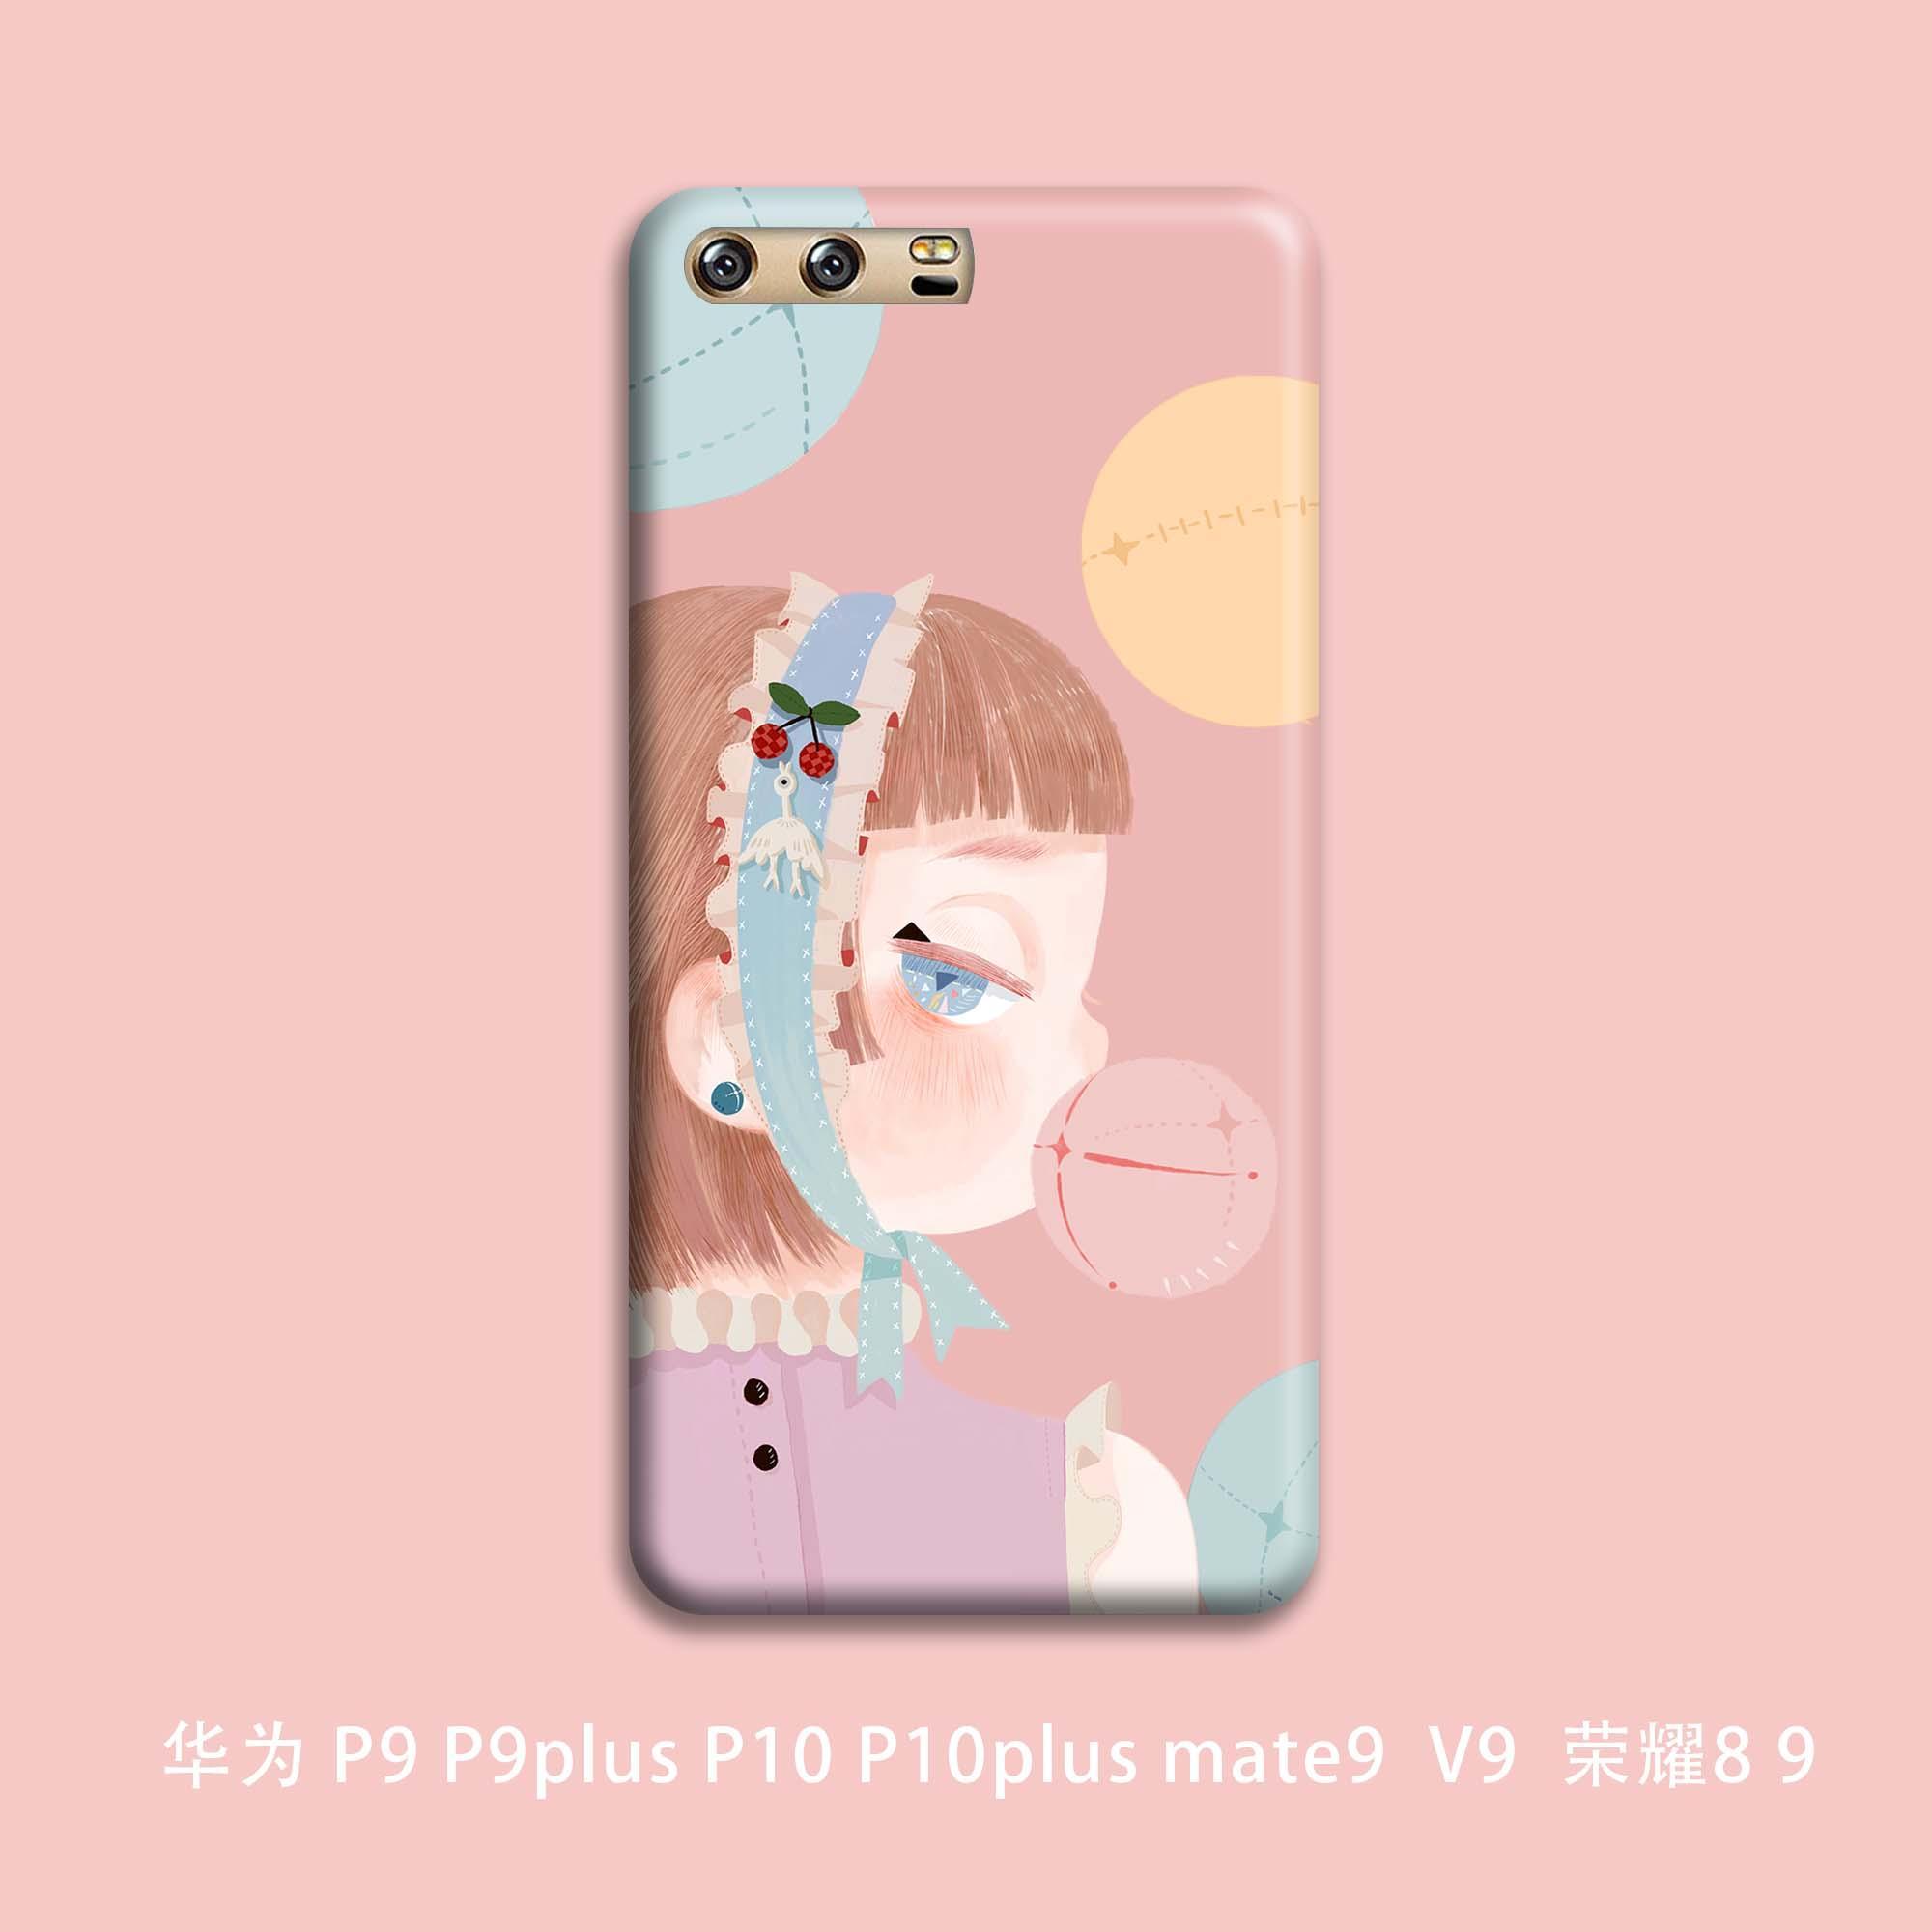 Padang Gurun Selubung Ponsel 10 Plus/Mate10/Nova2s Merah Muda Gadis Lulur